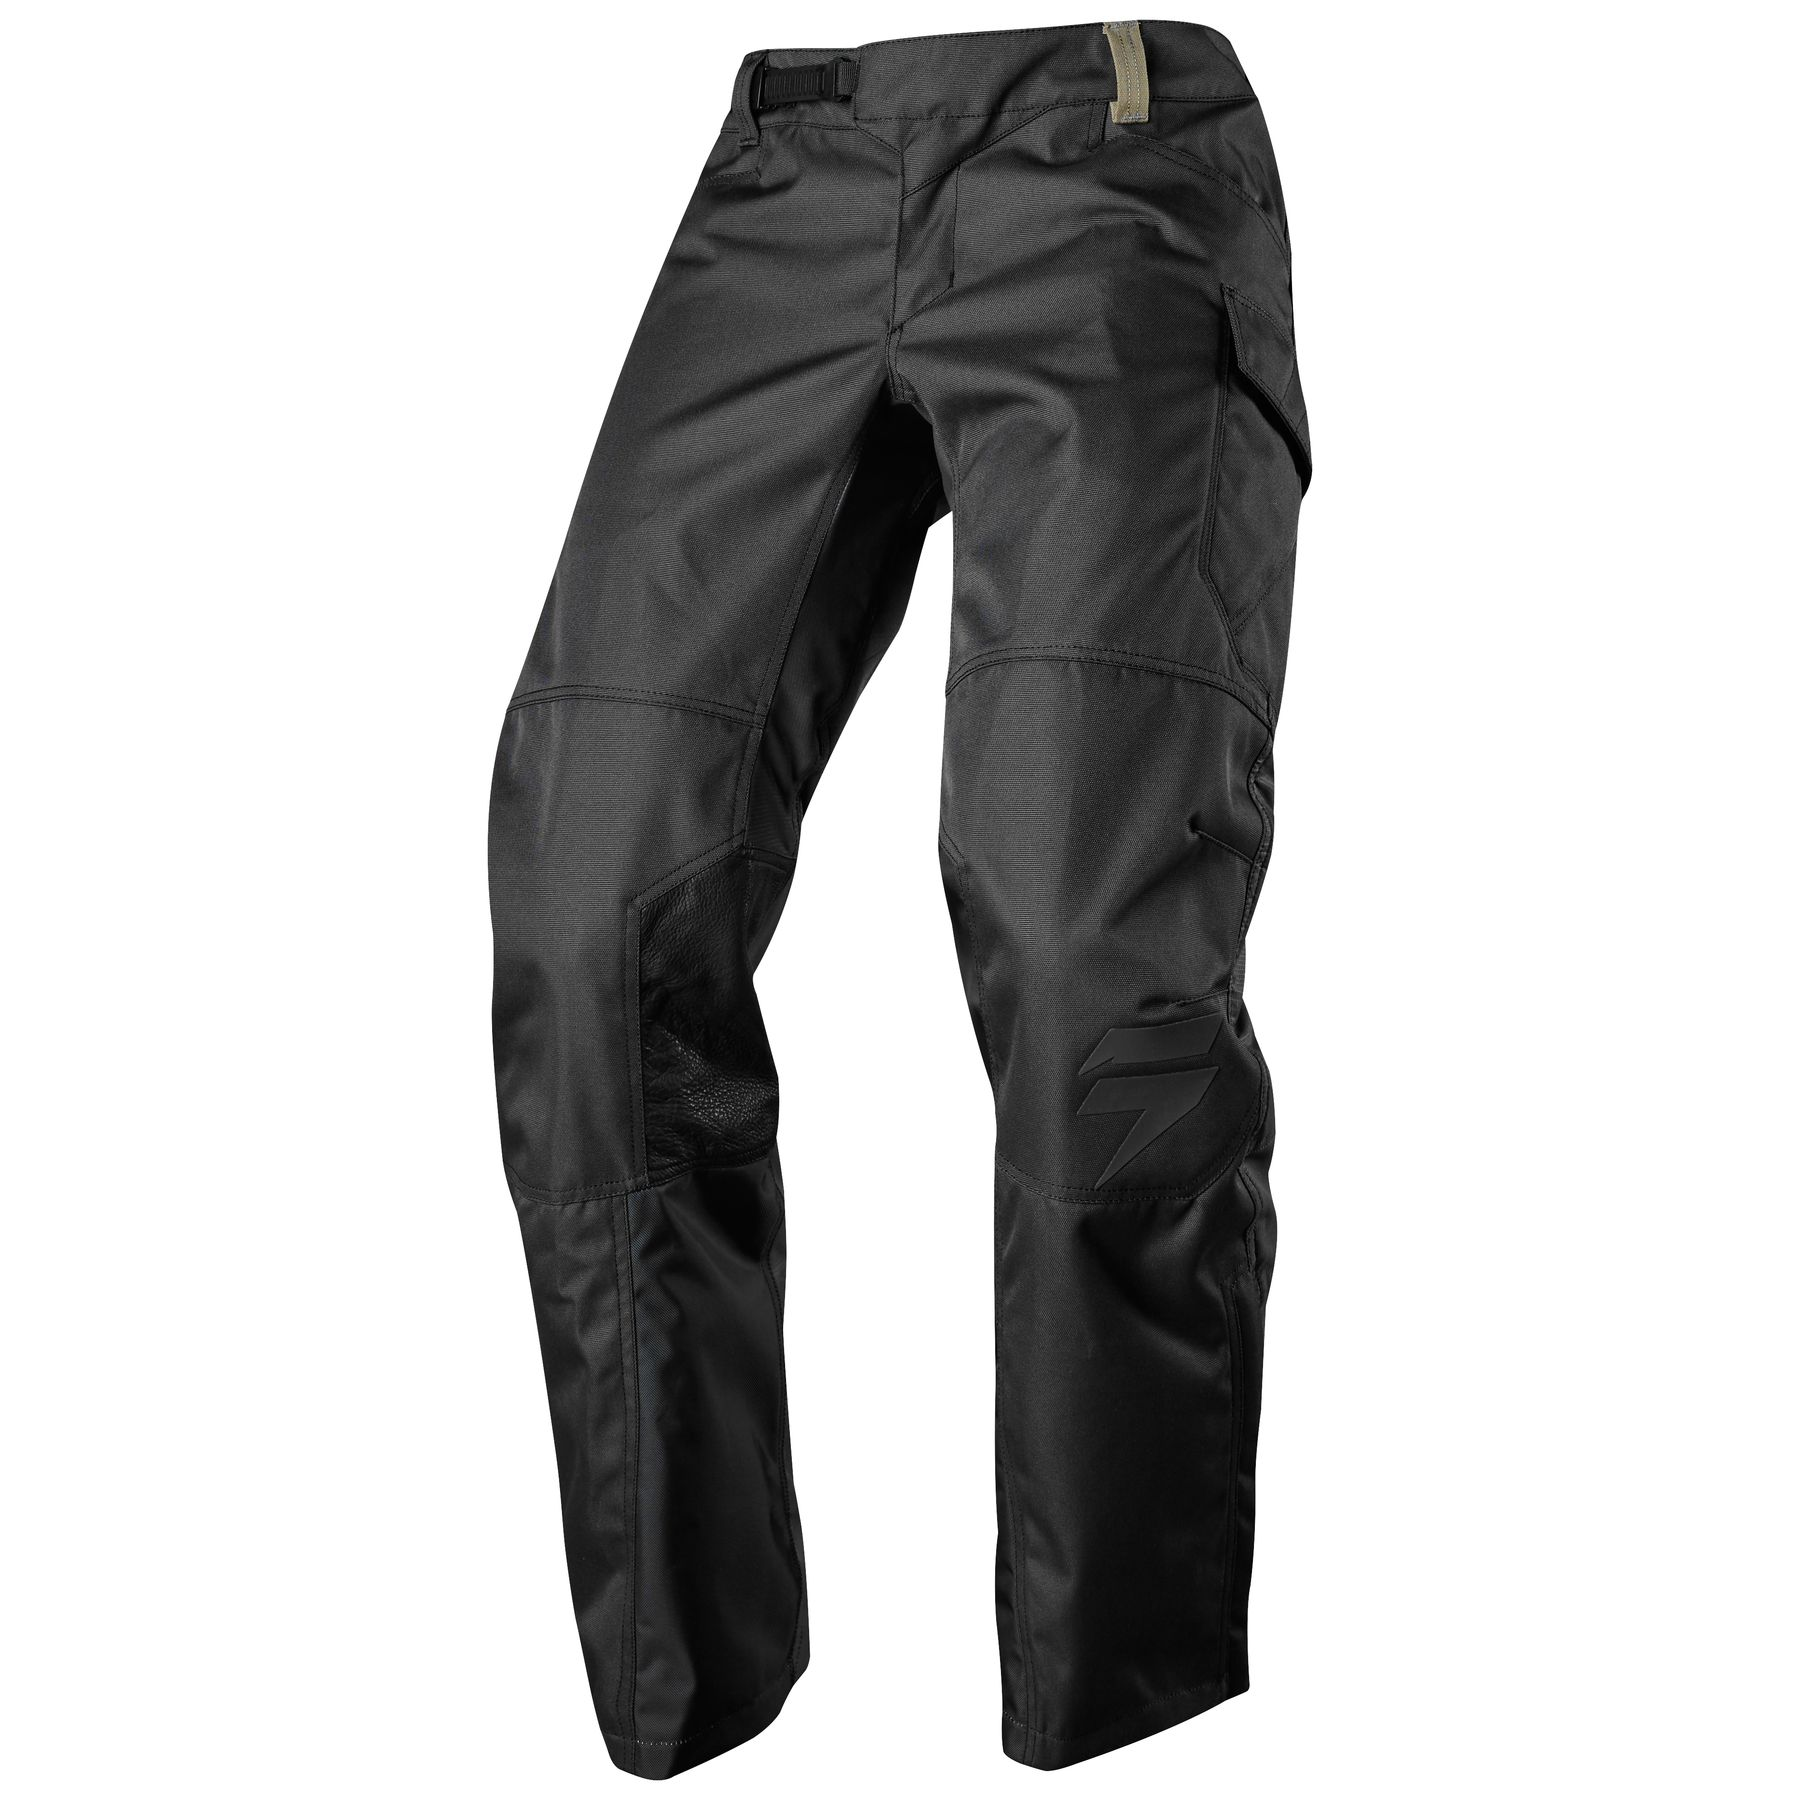 2019 Shift Recon Drift Pants-Black-42